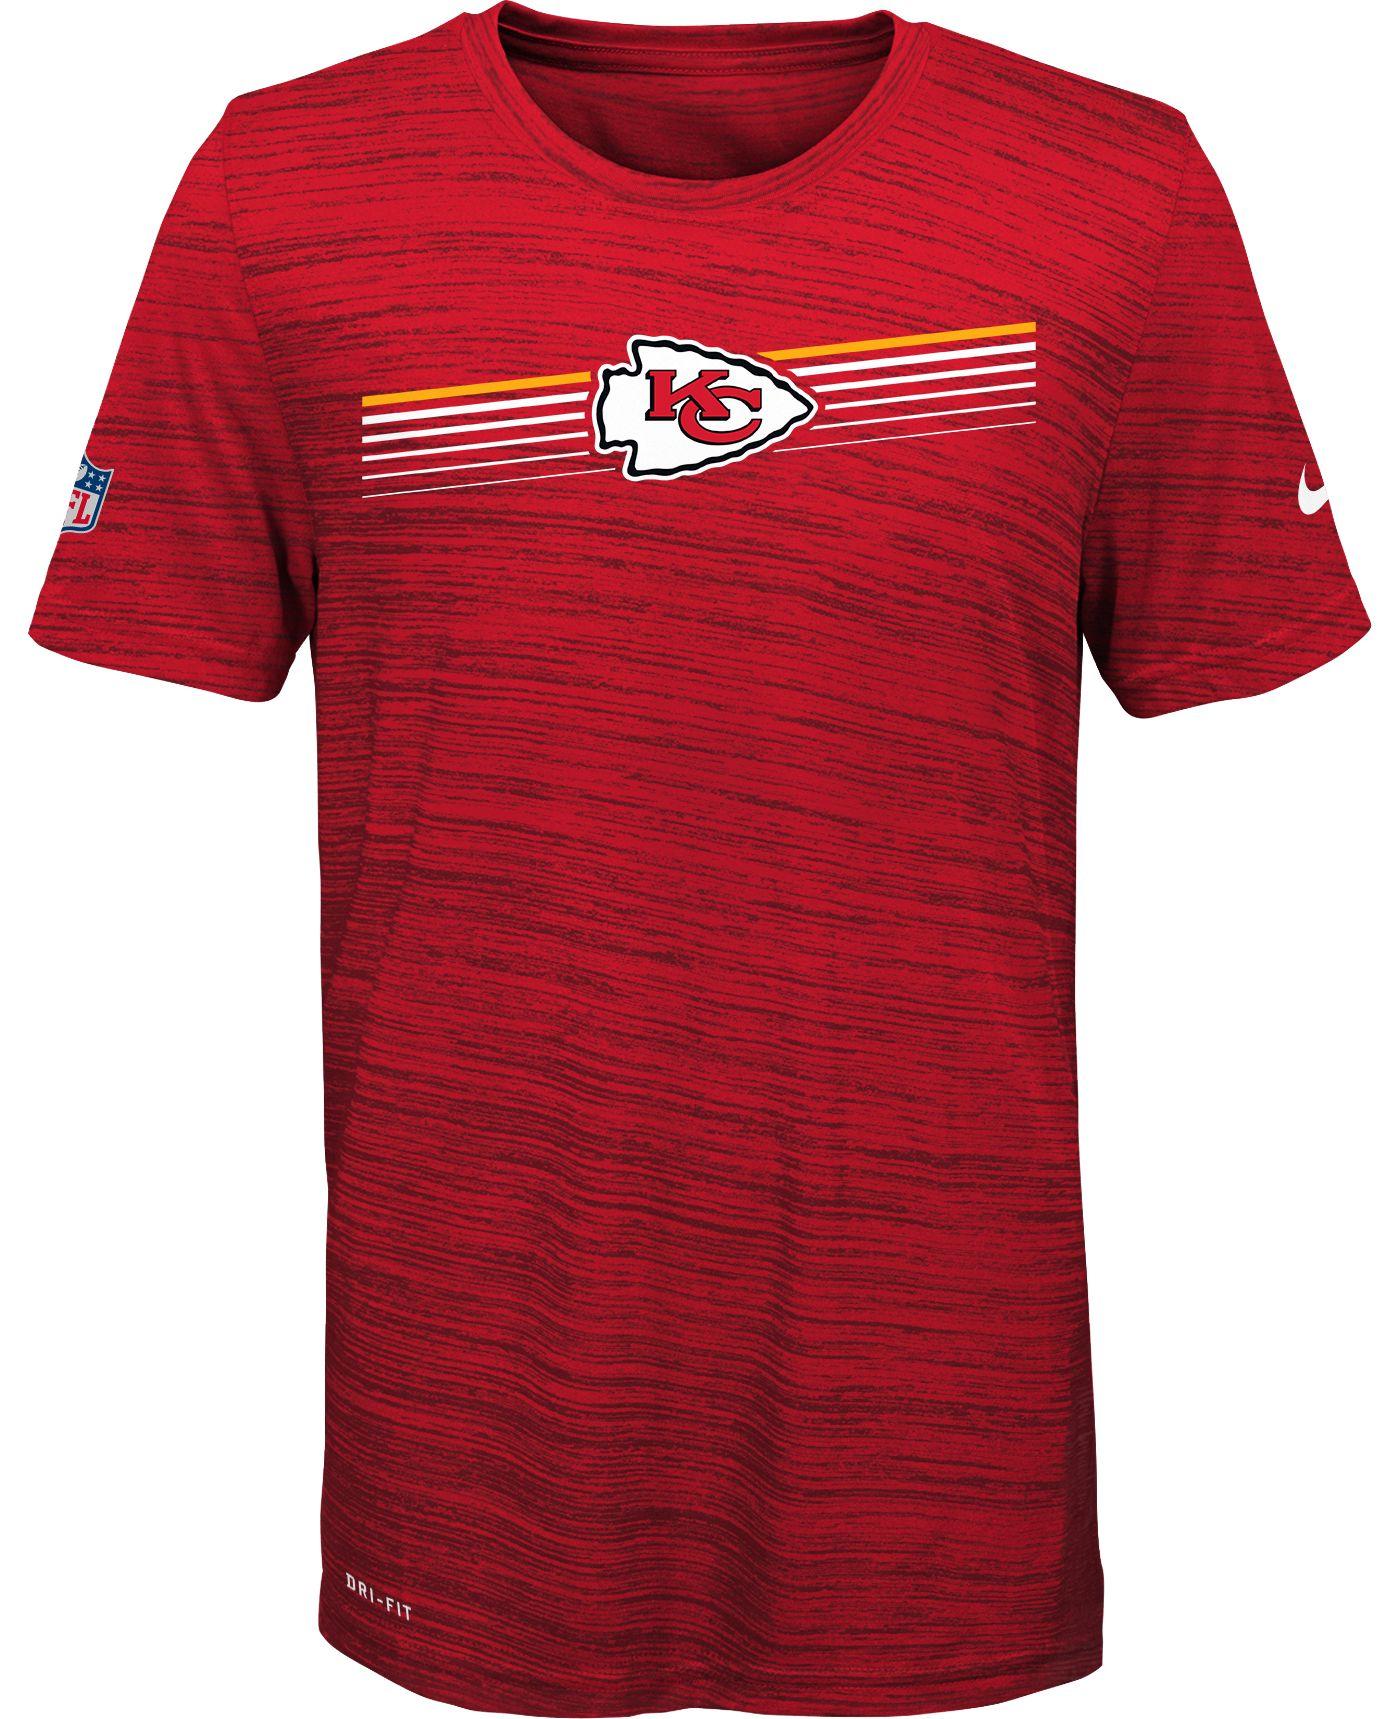 Nike Youth Kansas City Chiefs Legend Velocity Performance Red T-Shirt